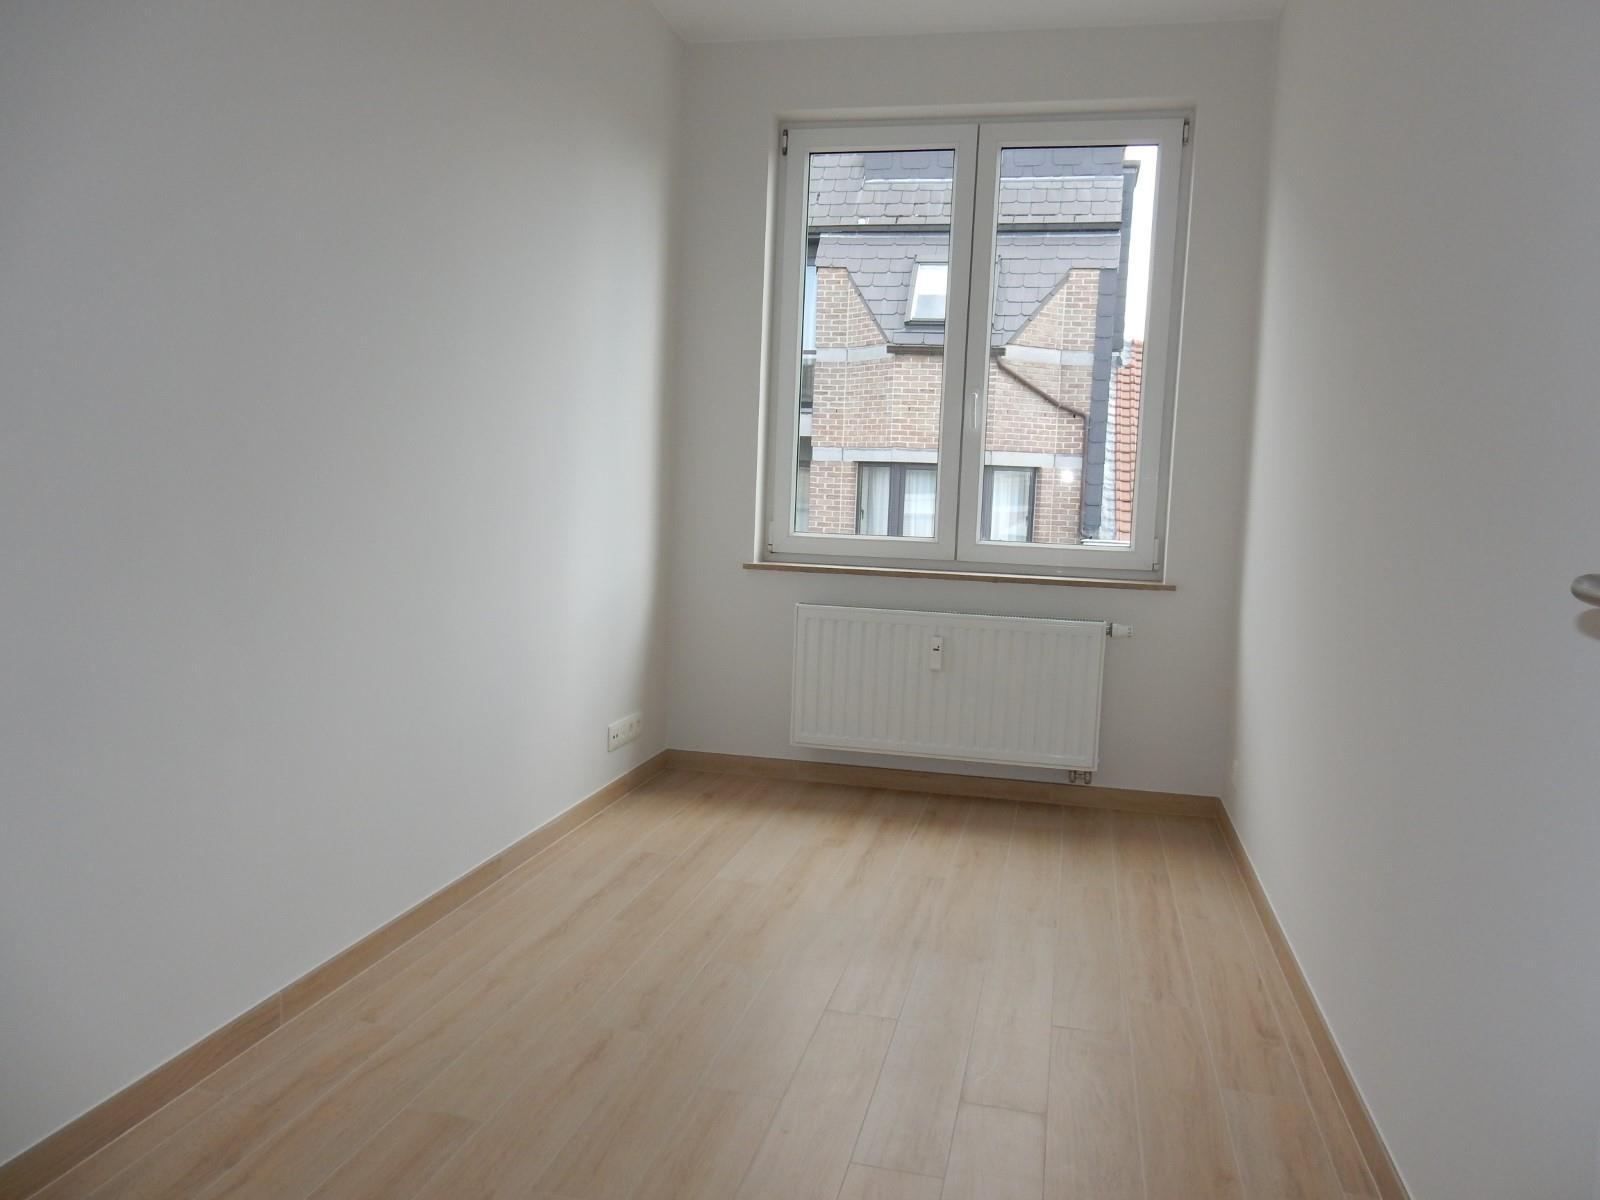 Appartement - Auderghem - #3071643-9